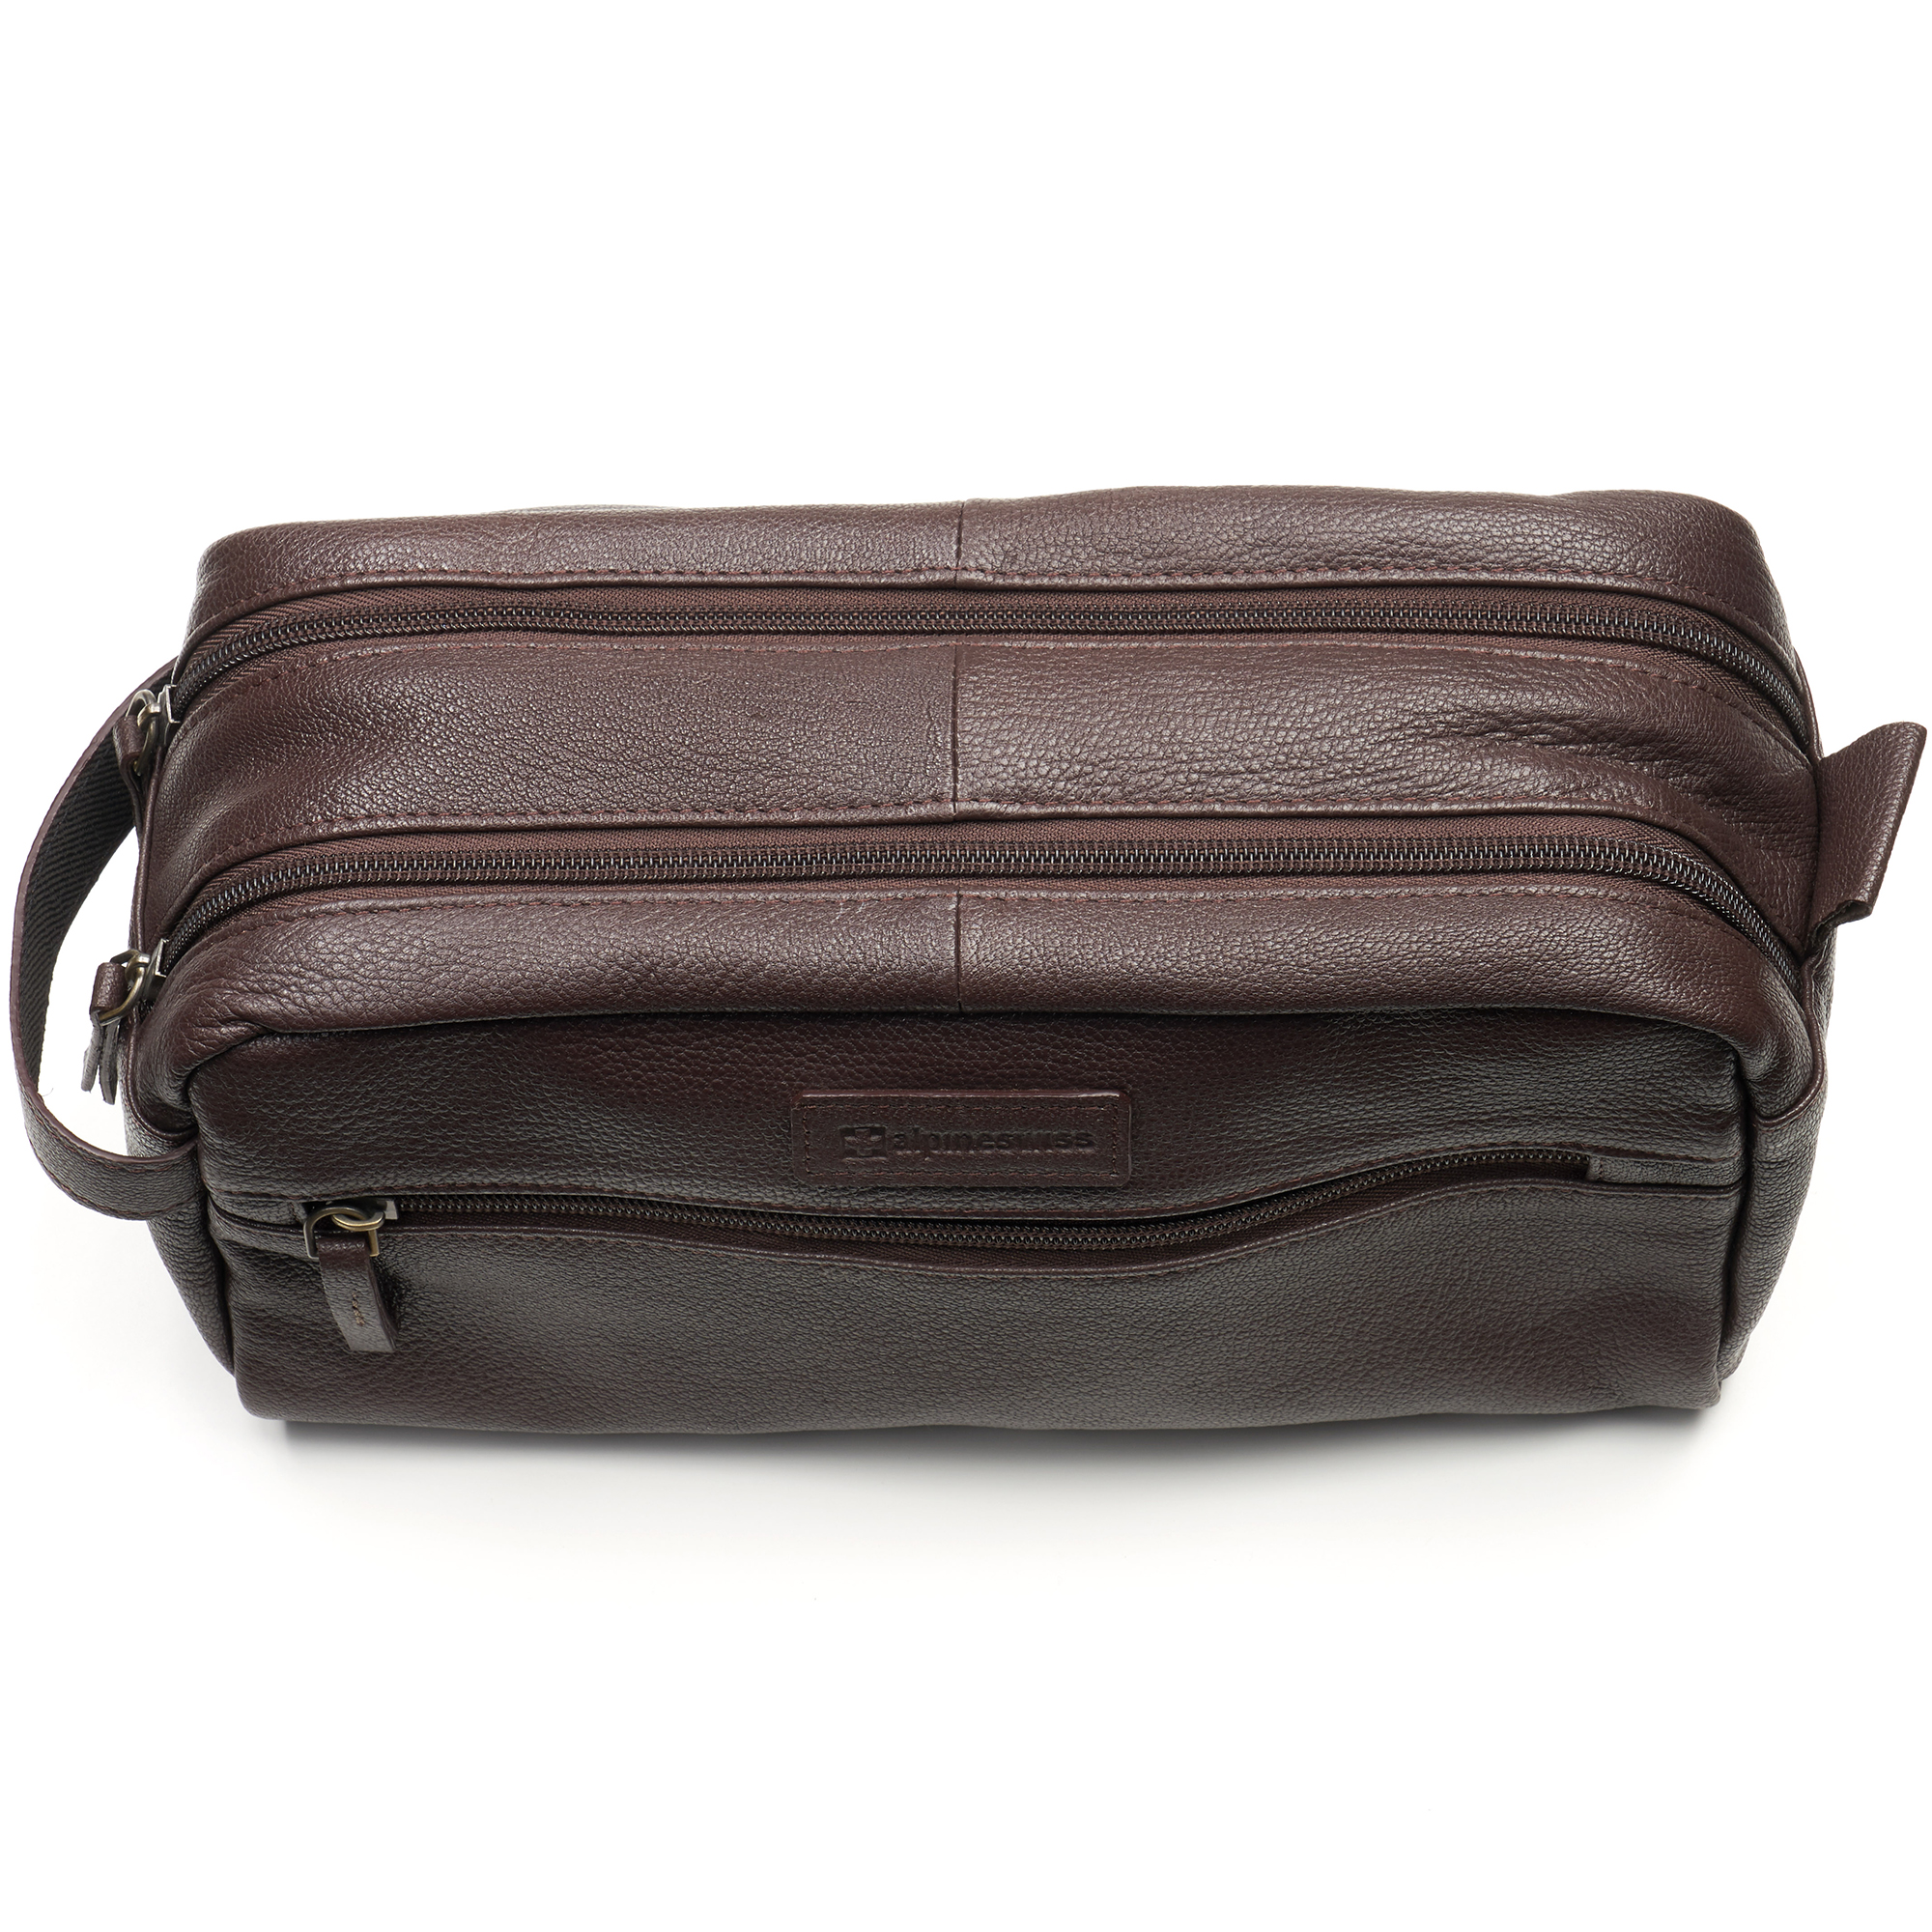 AlpineSwiss-Sedona-Toiletry-Bag-Genuine-Leather-Shaving-Kit-Dopp-Kit-Travel-Case thumbnail 21